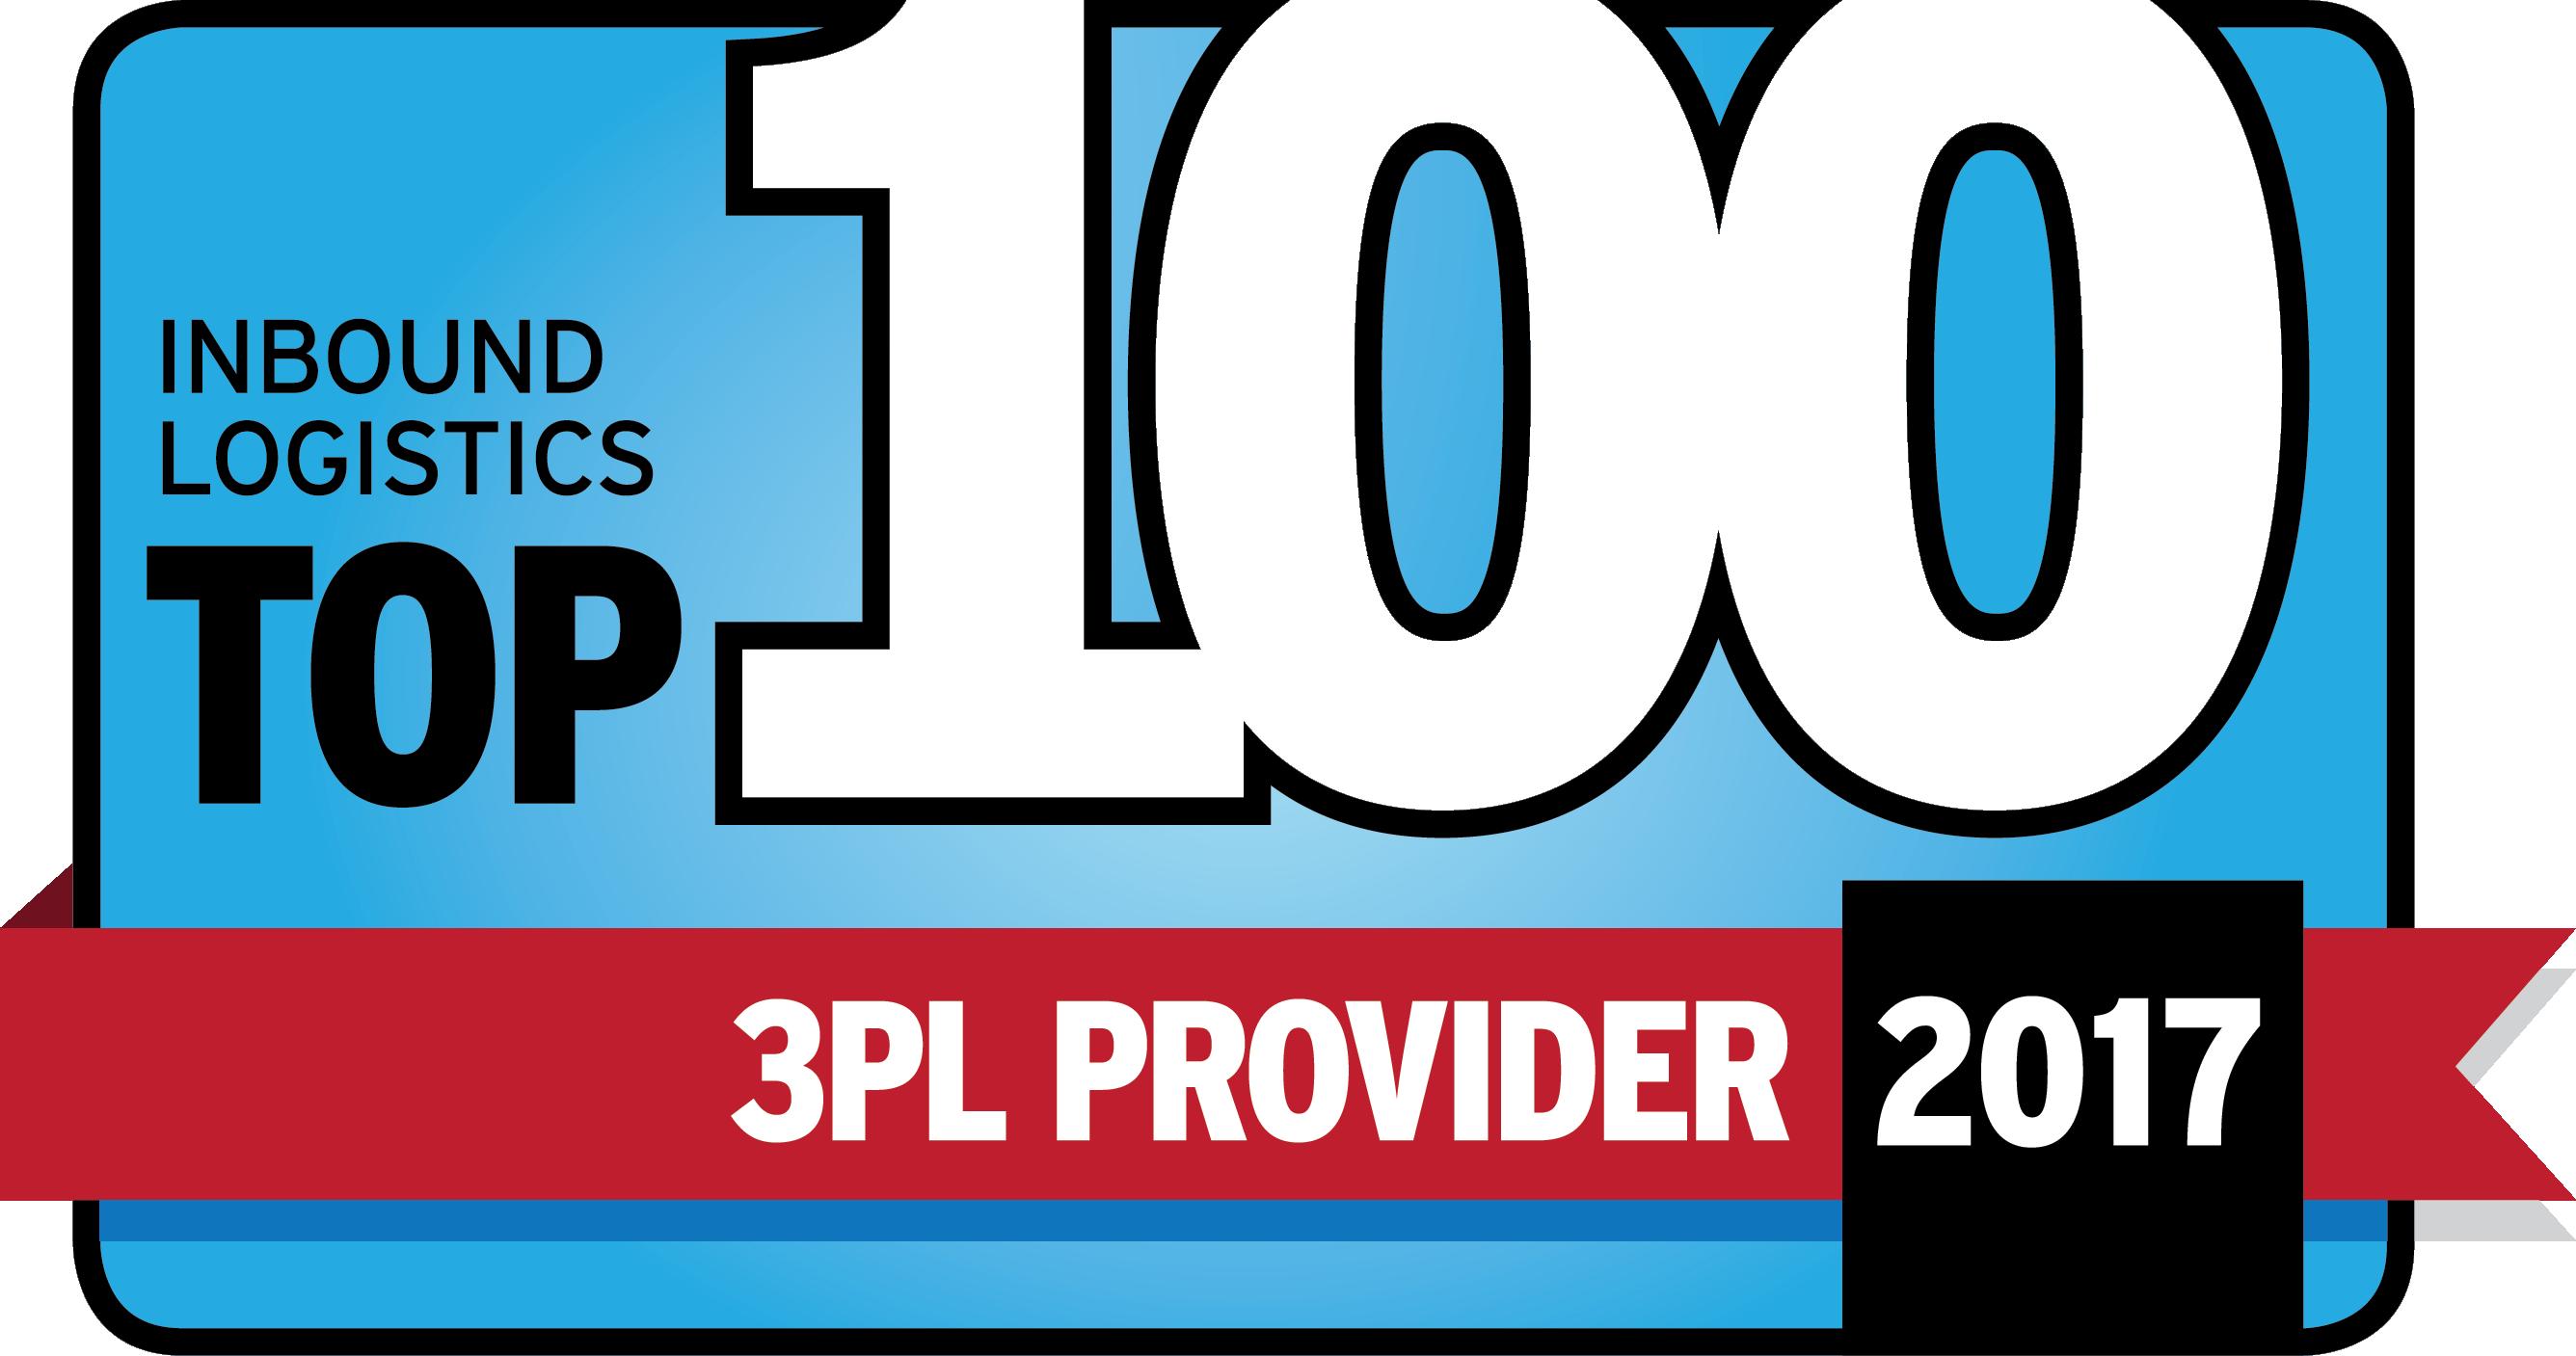 Vector Illustrator 11 MB Top 100 3PL Logo 2016